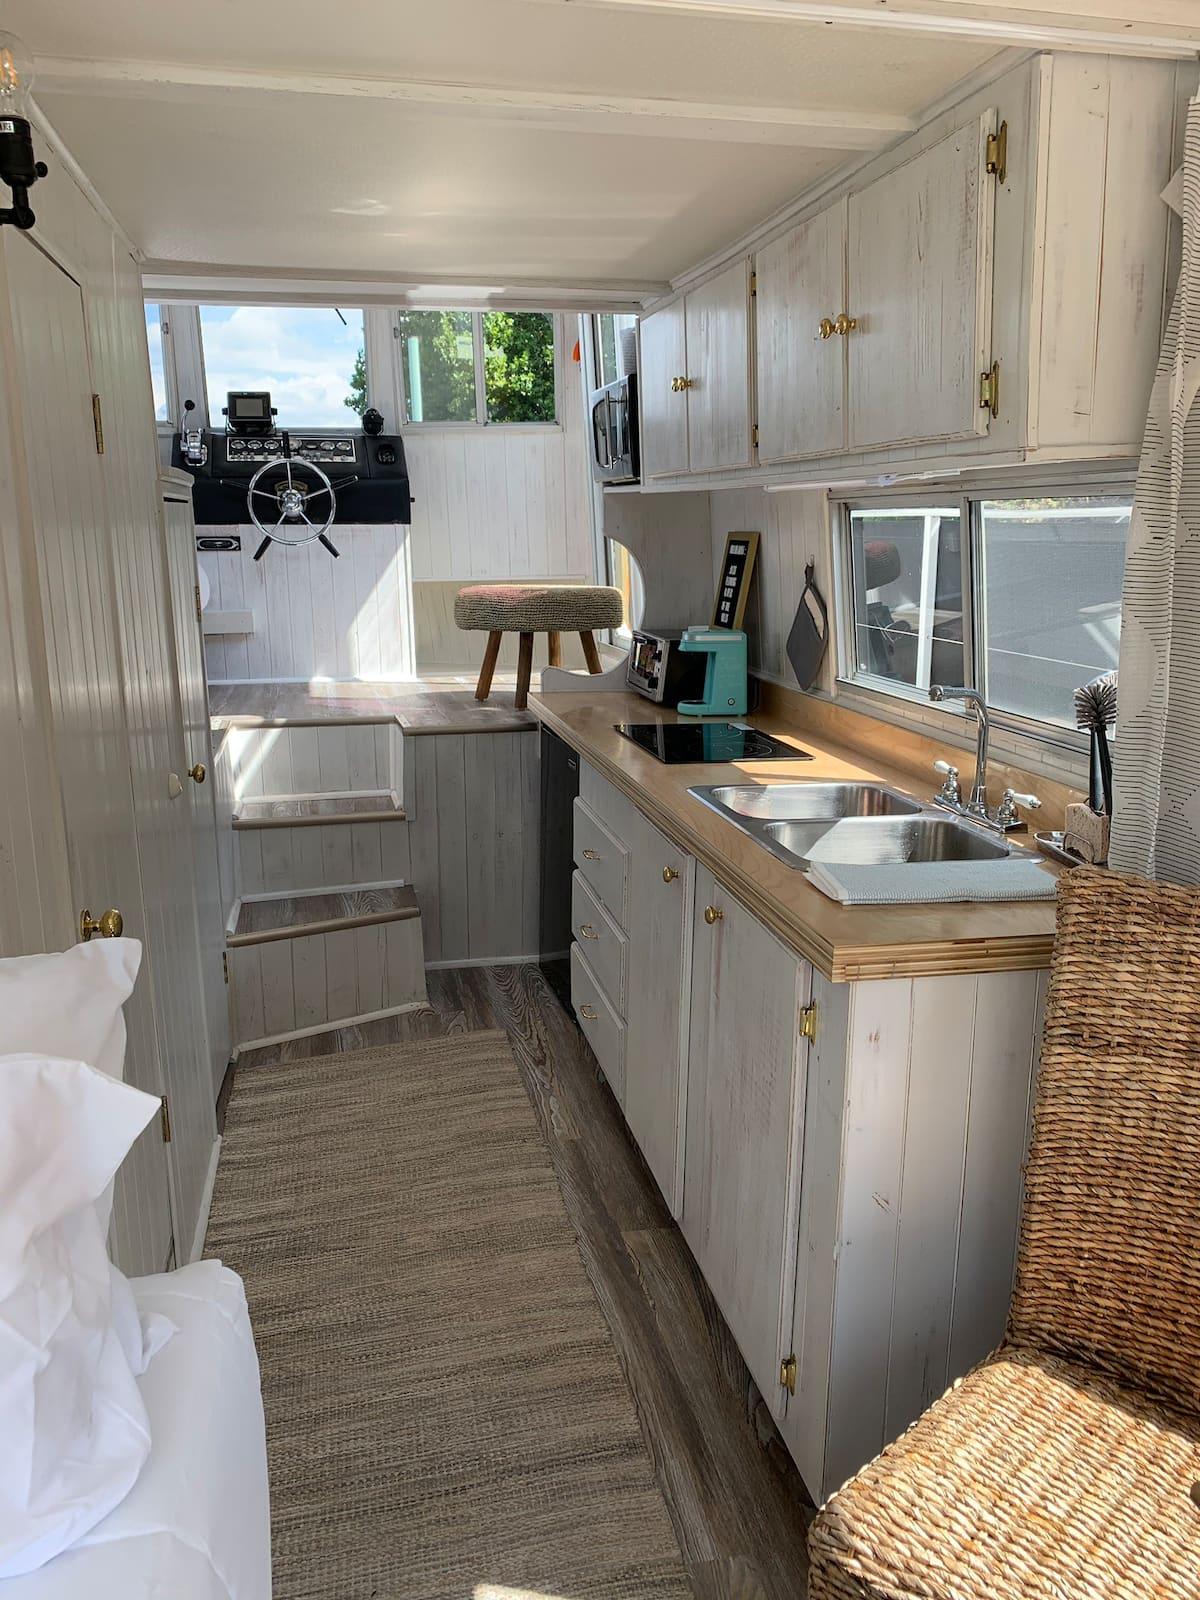 Houseboat Air Bnb